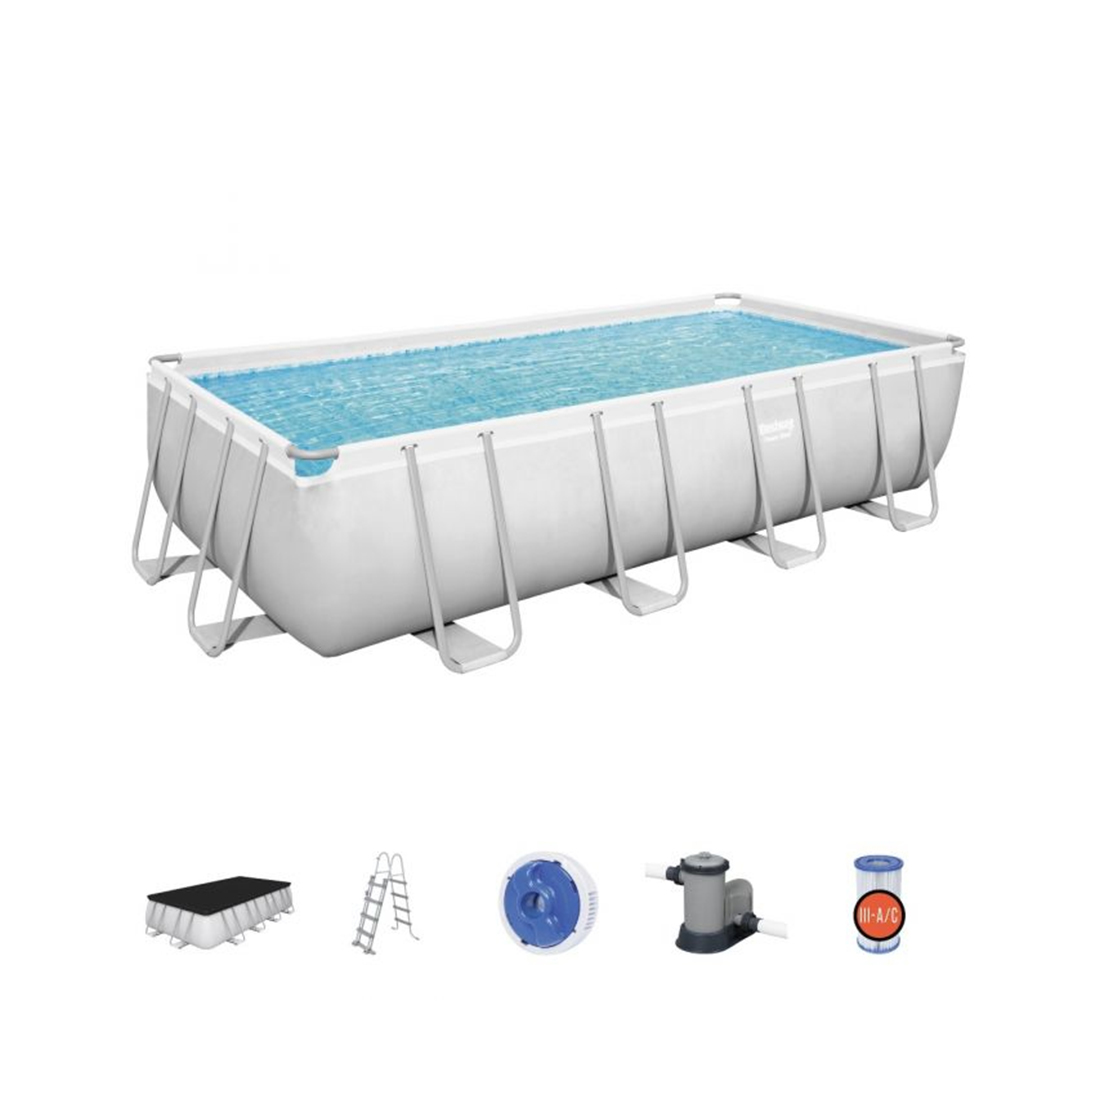 Каркасный бассейн Bestway 56465 (56223)